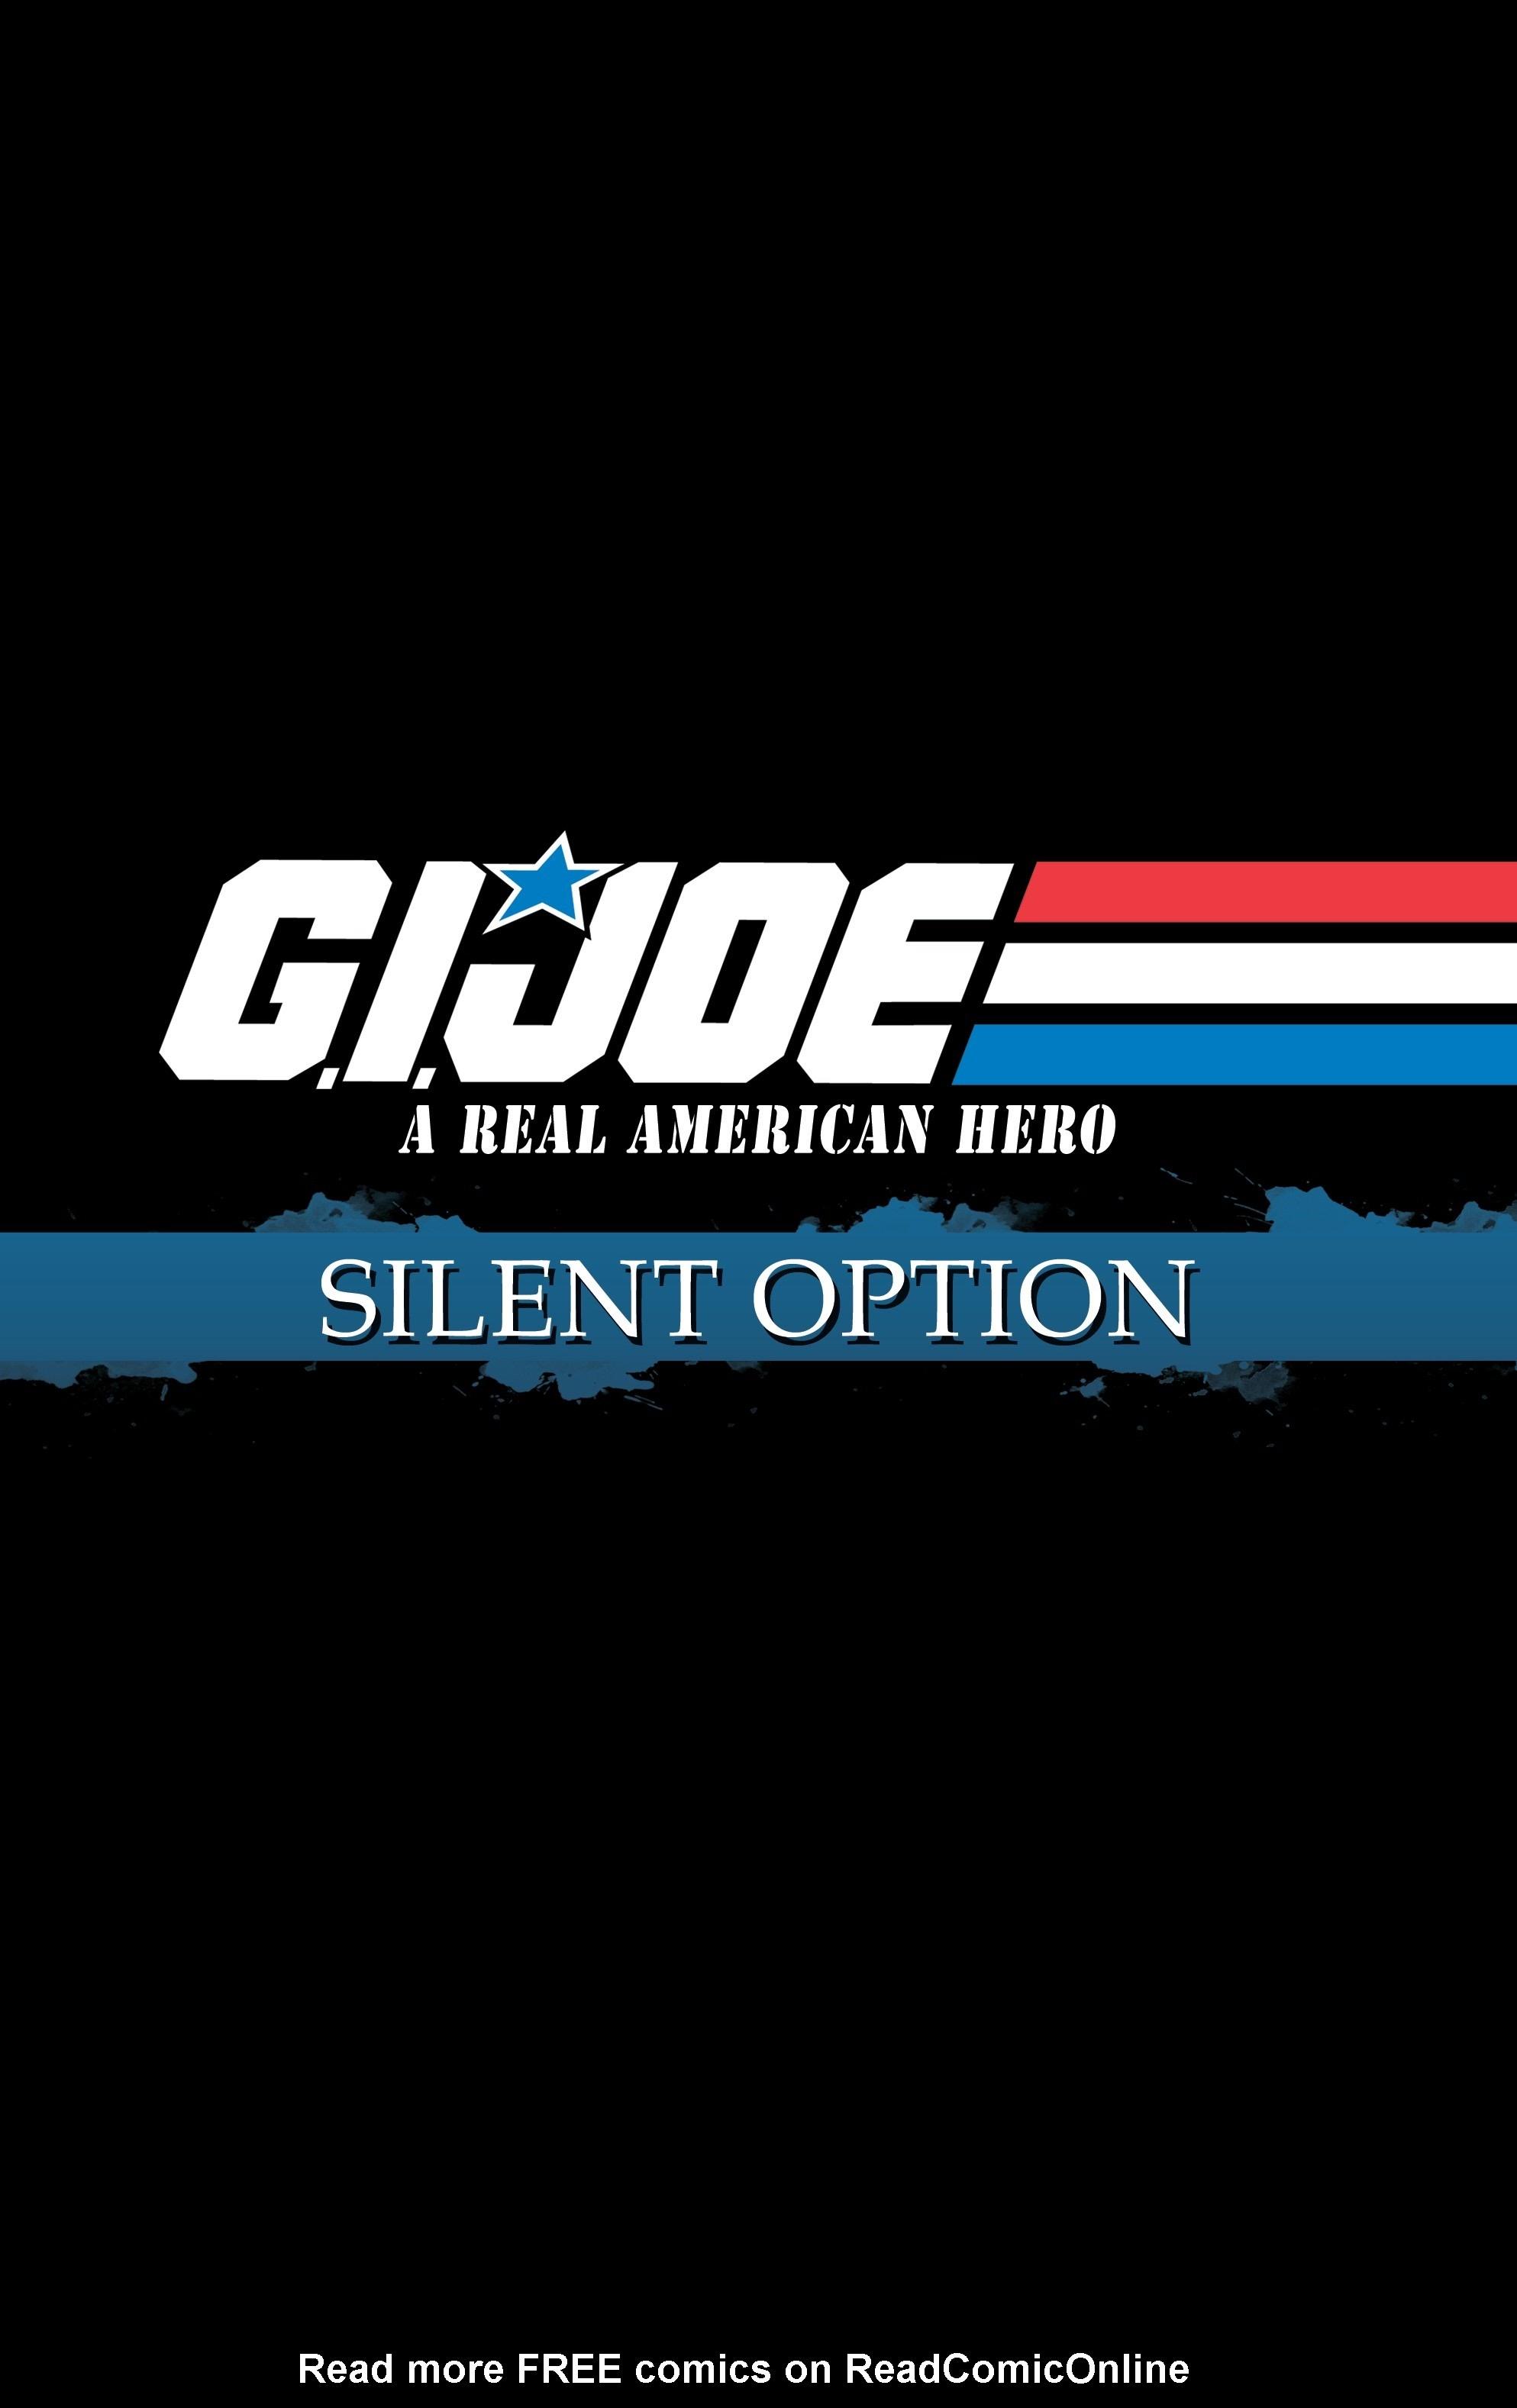 G.I. Joe: A Real American Hero: Silent Option Issue # 4 - ReadComic.Org